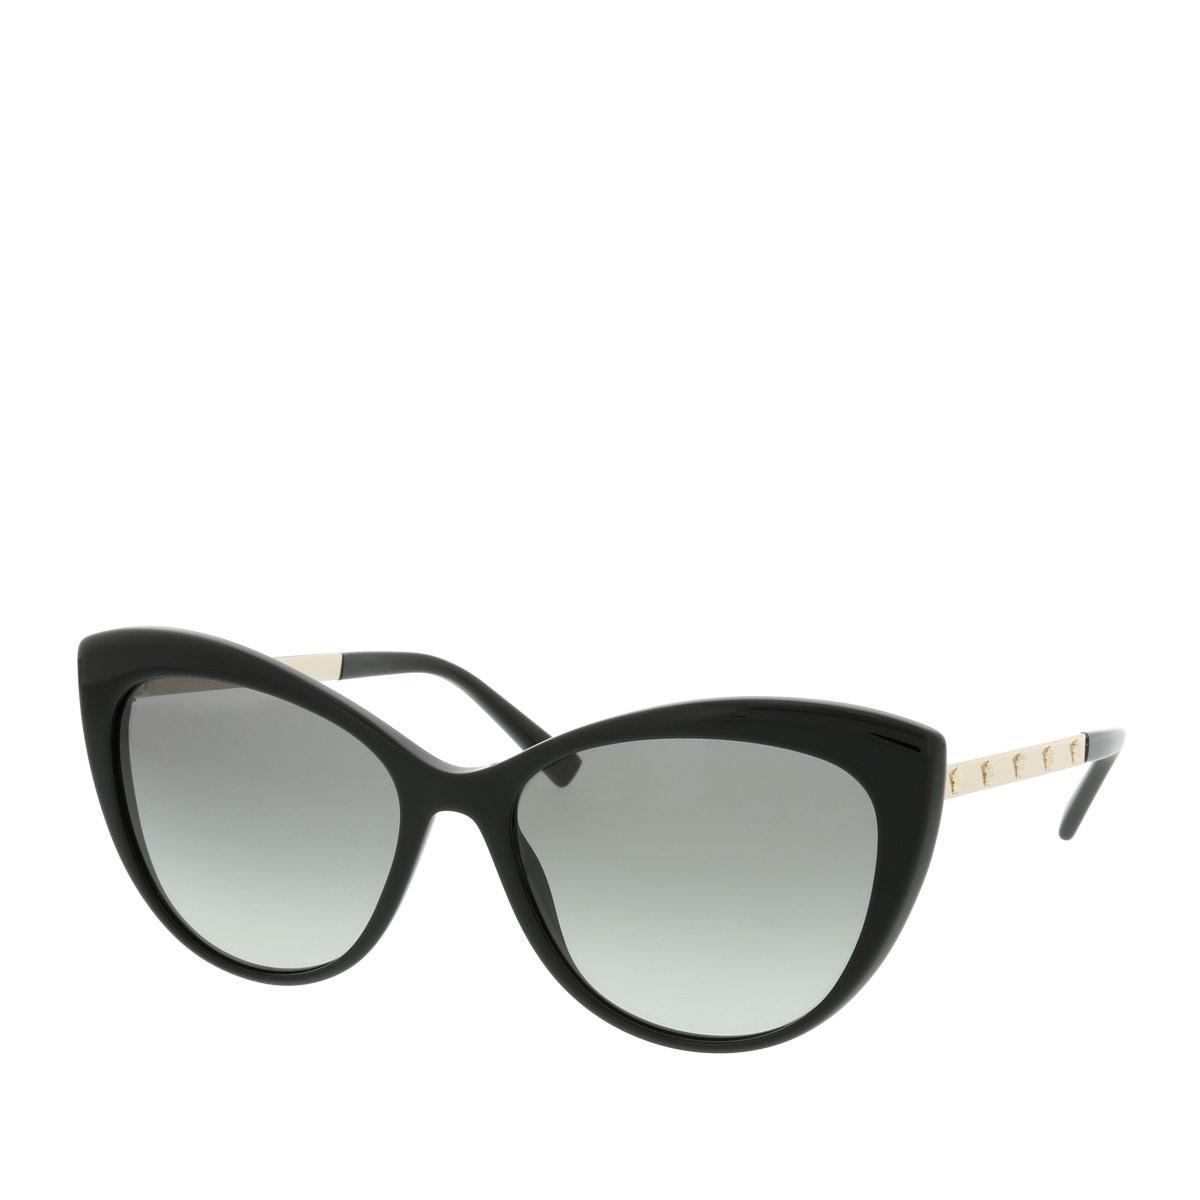 eb83c35670 Versace Ve 0ve4348 57 Gb1 11 in Black - Lyst